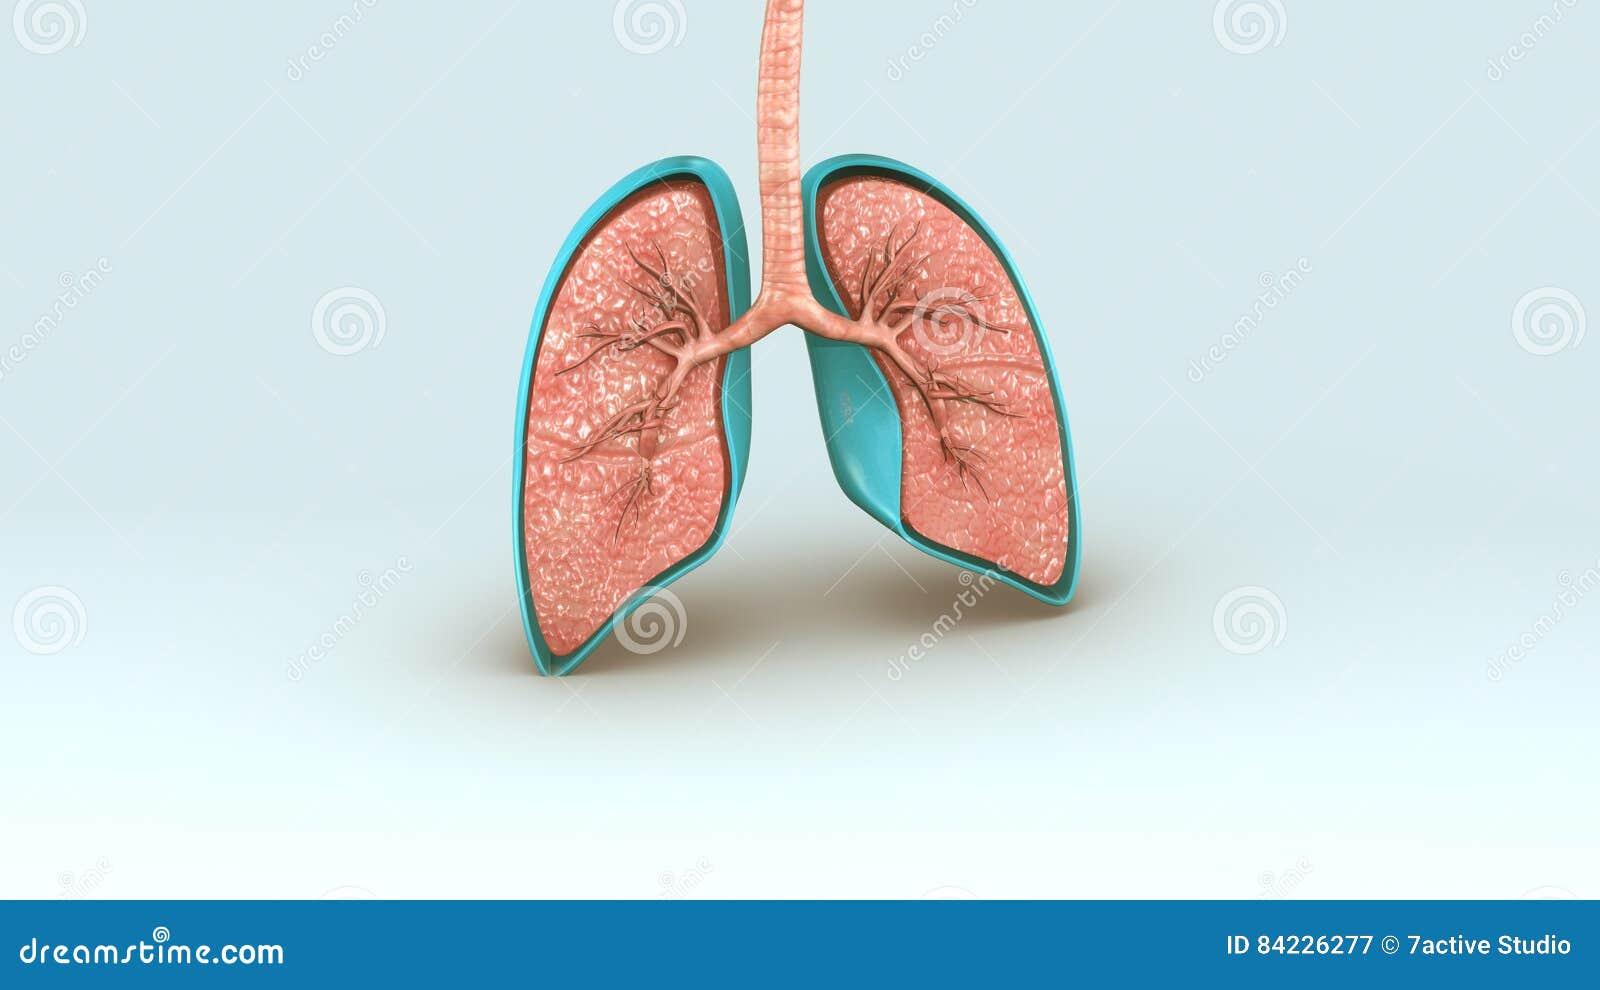 Respiratory System stock illustration. Illustration of anatomy ...